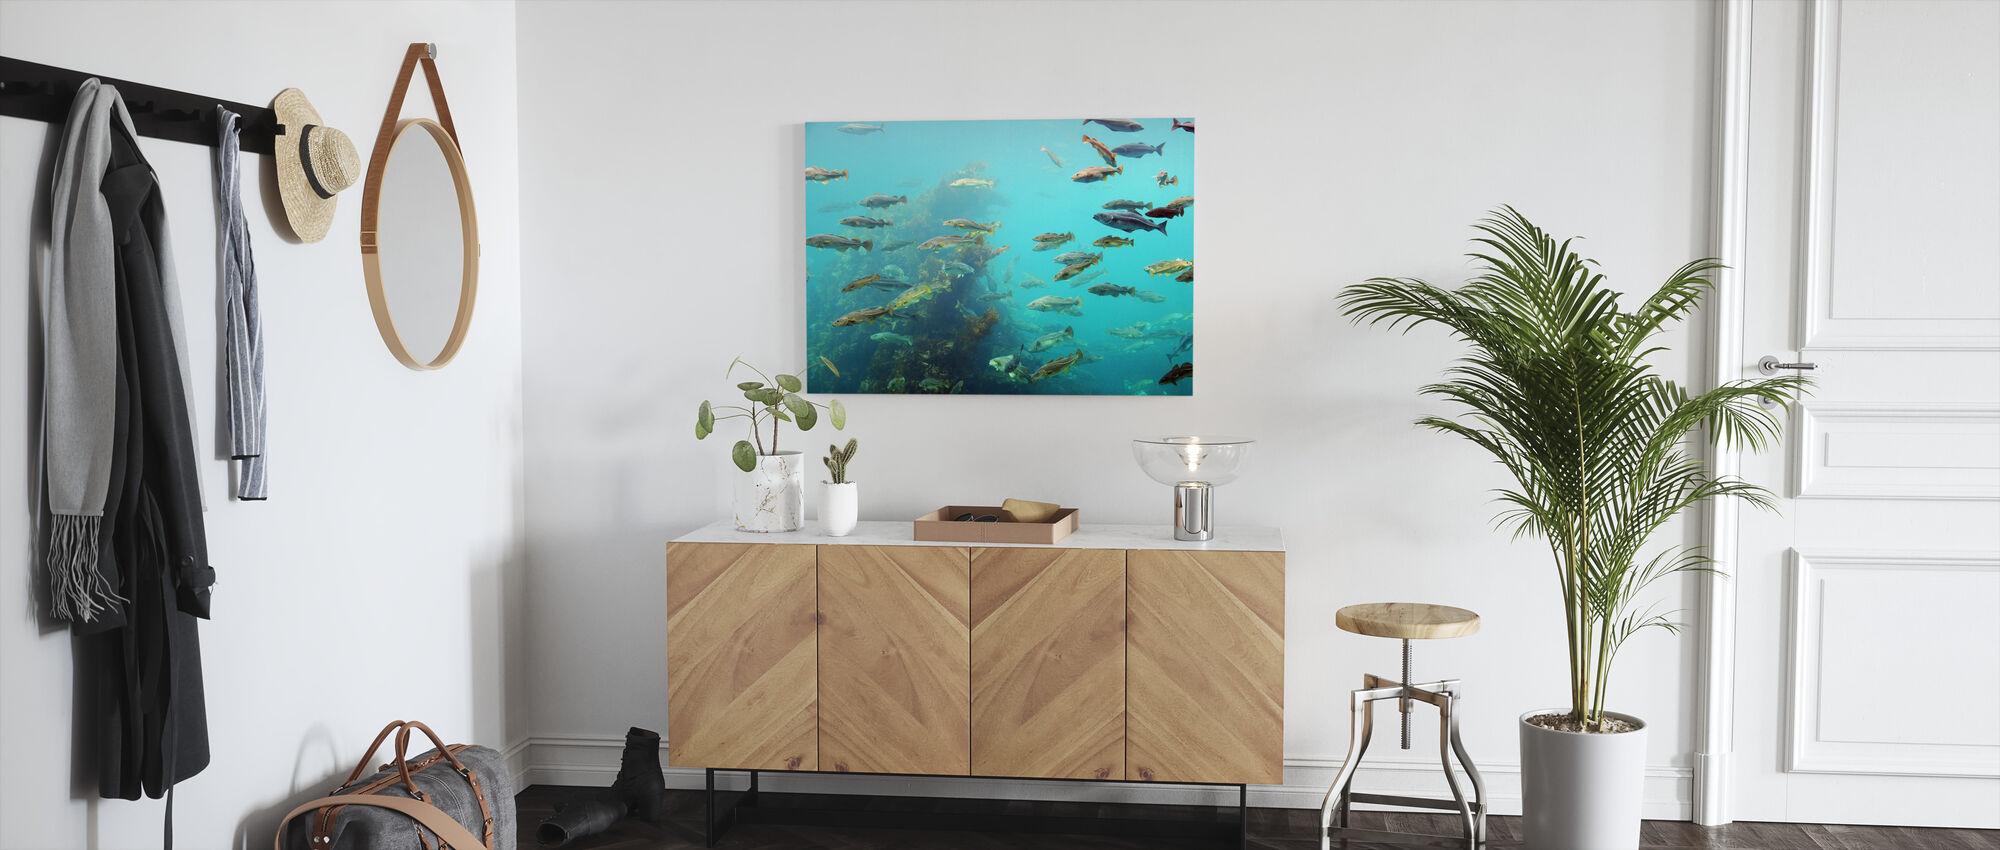 Sirkle fisk - Lerretsbilde - Gang